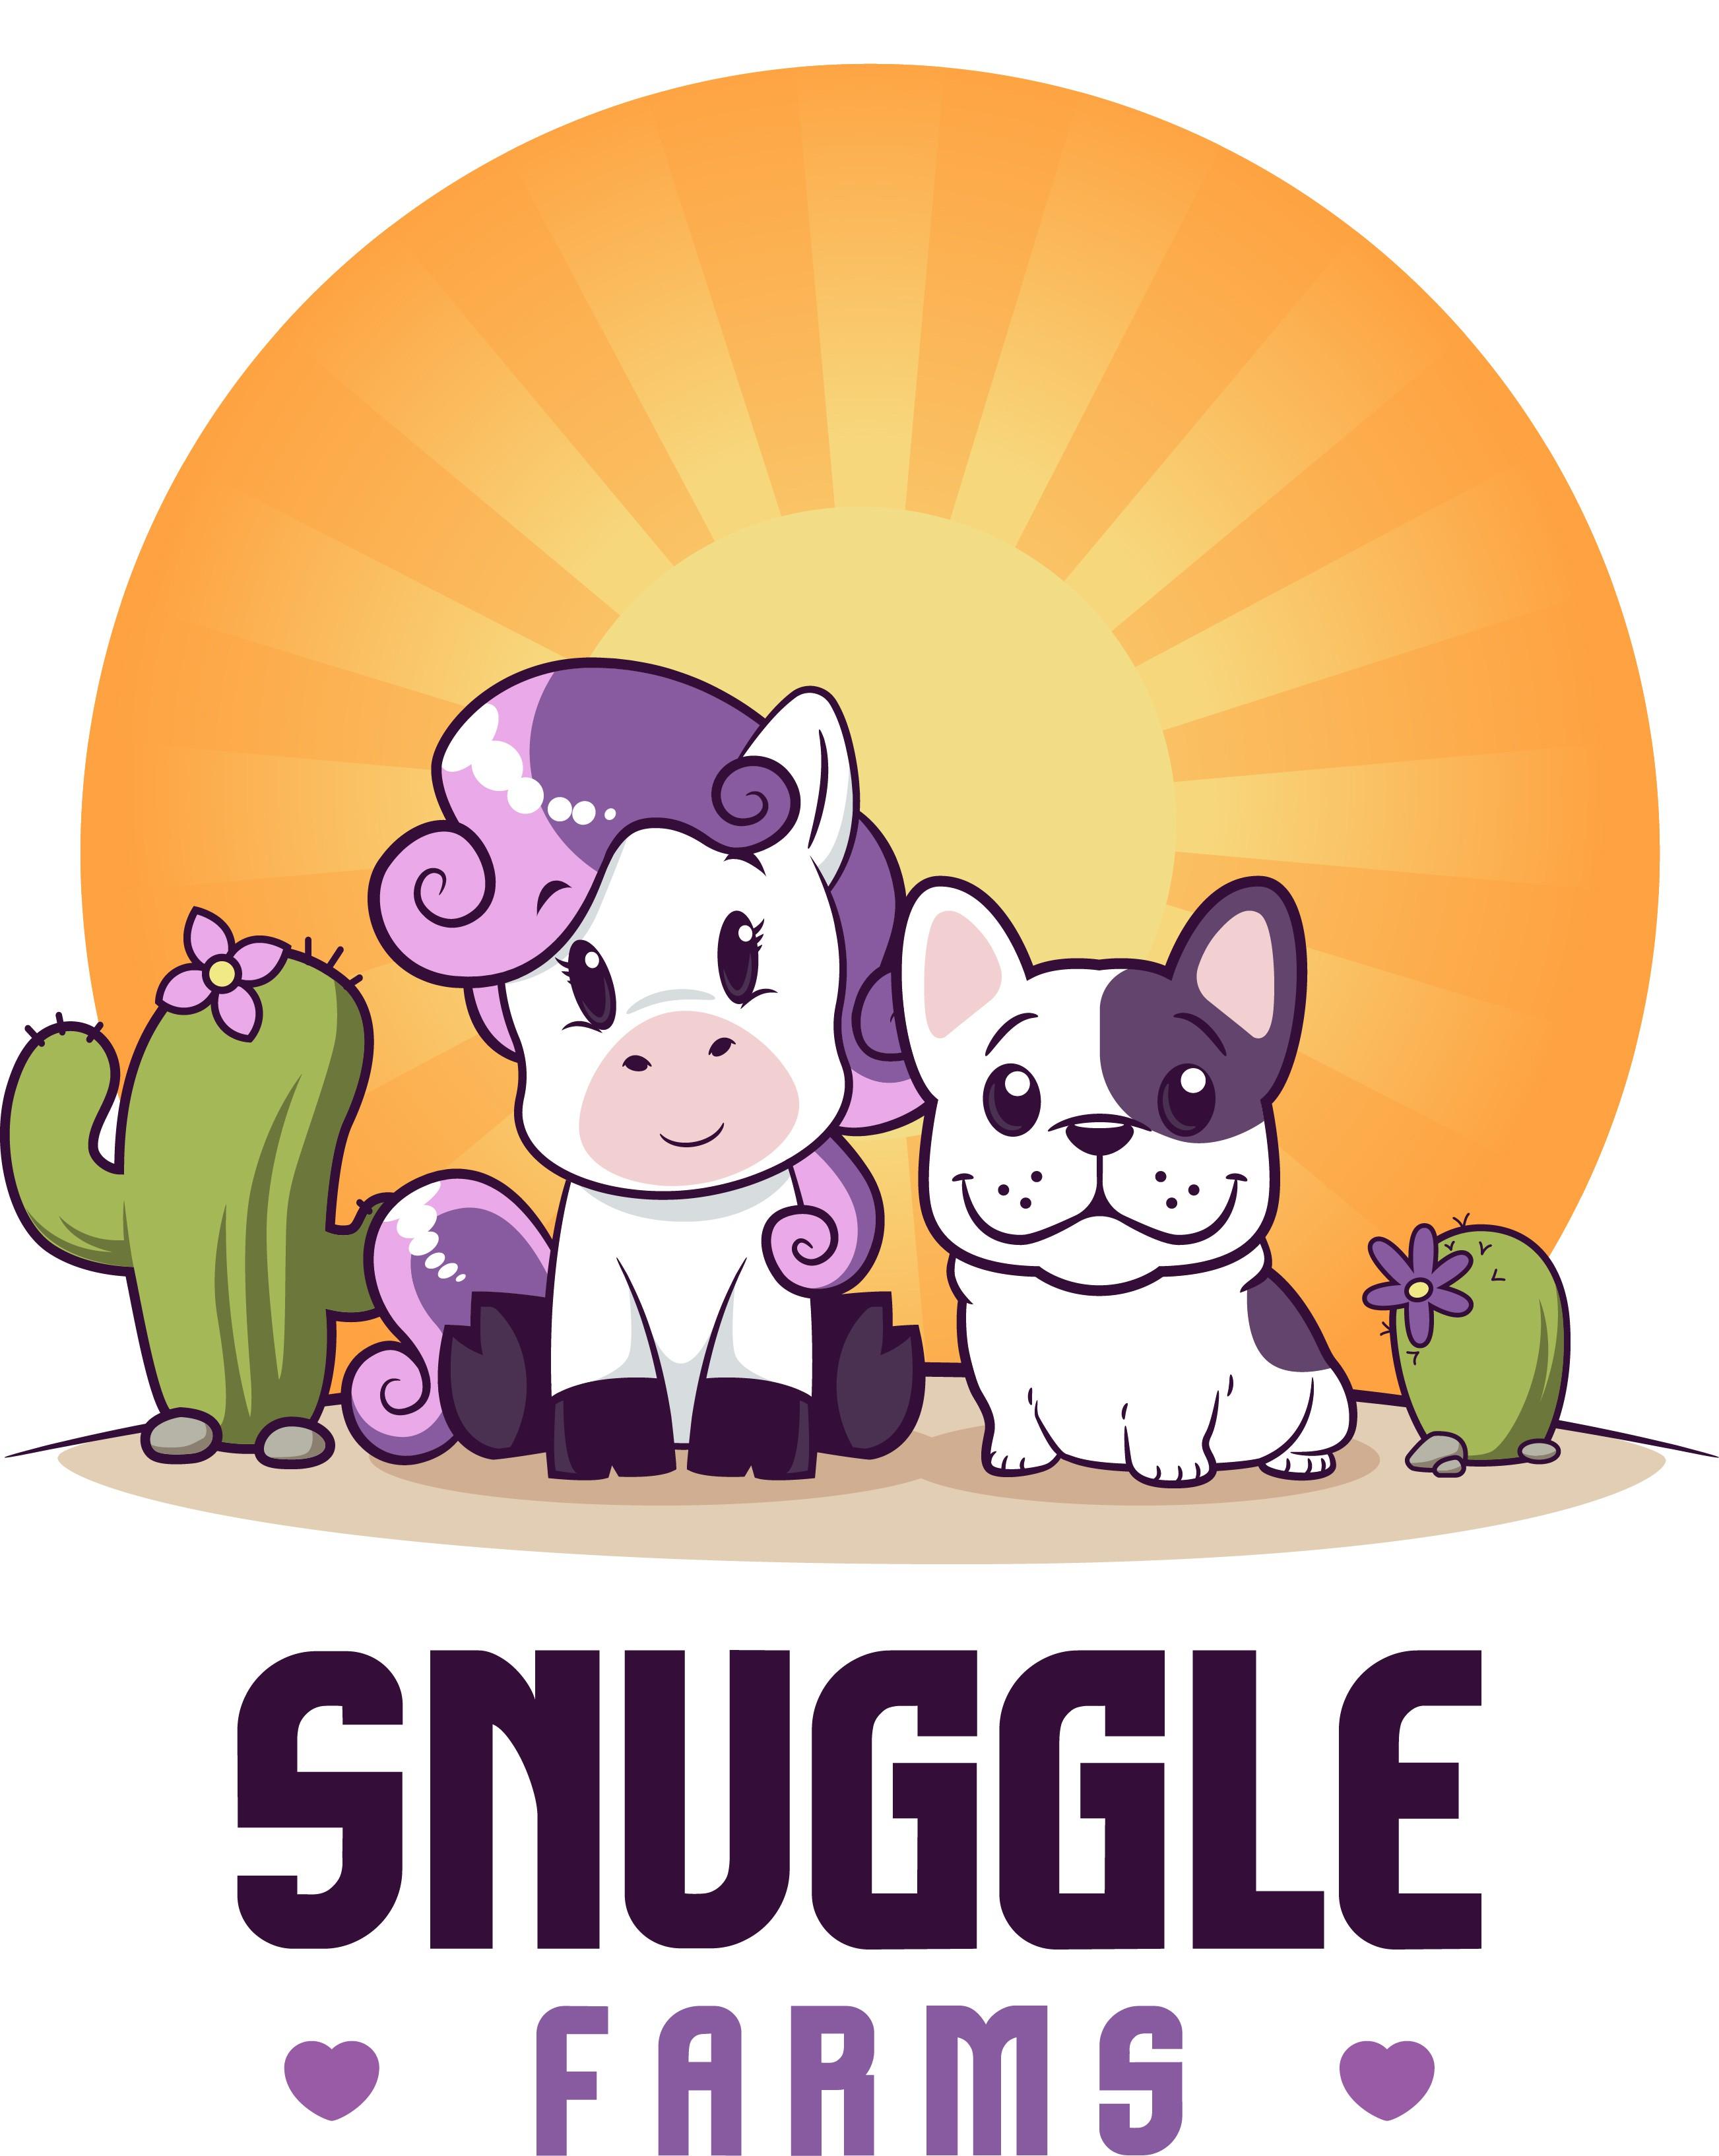 ADORABLE French Bulldog and Pony Logo Needed!  FUN TO DESIGN!